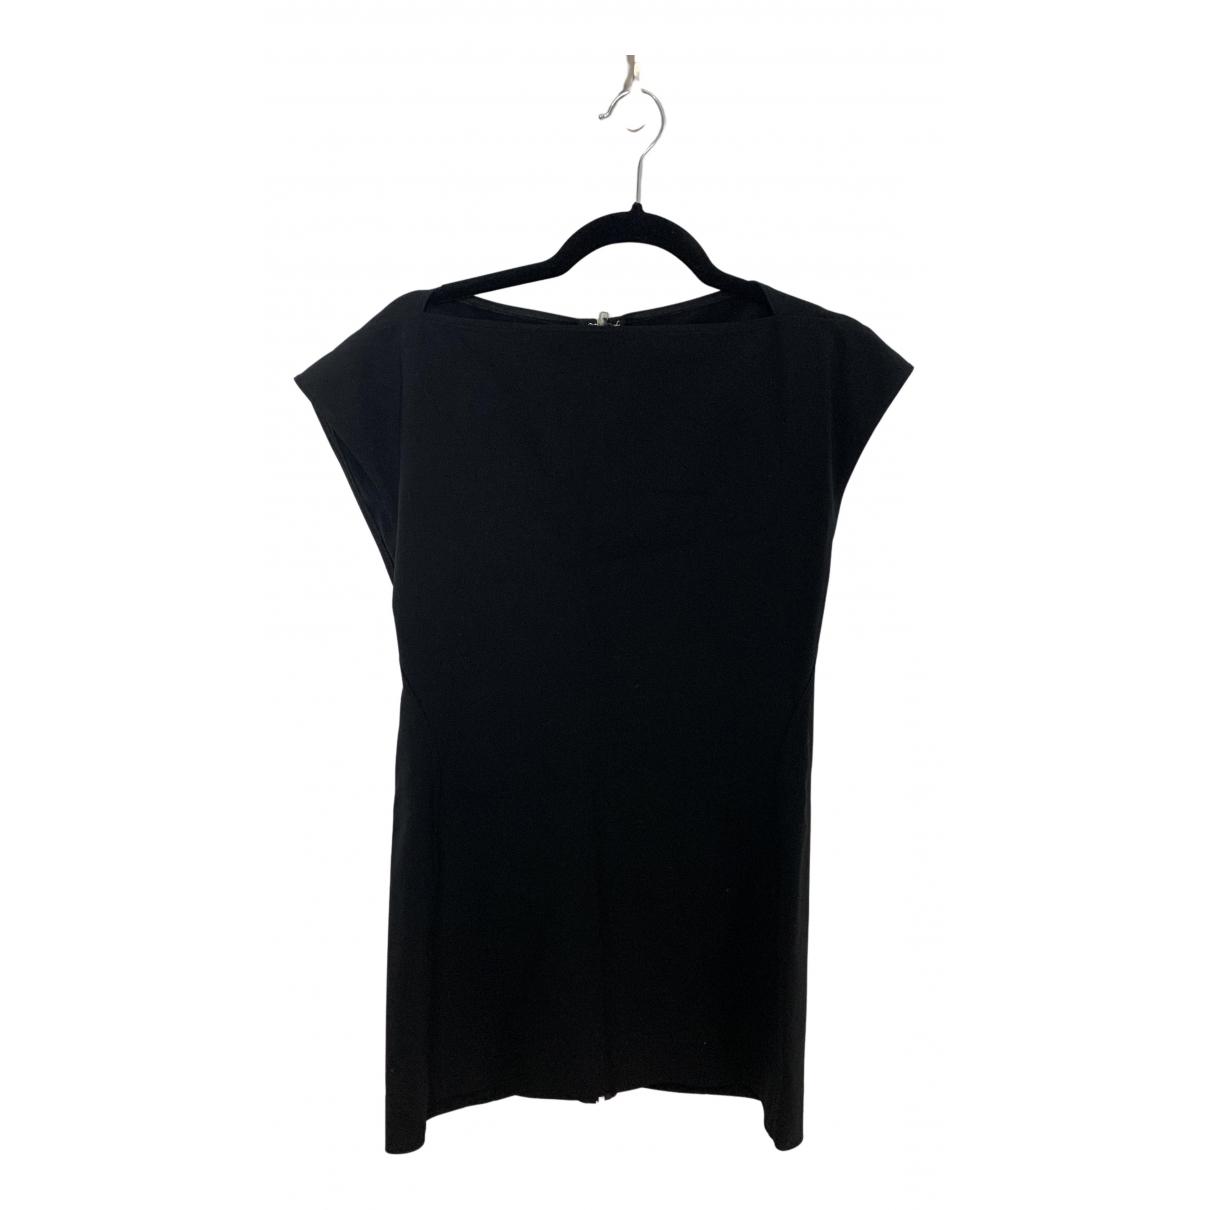 Rick Owens N Black dress for Women One Size International